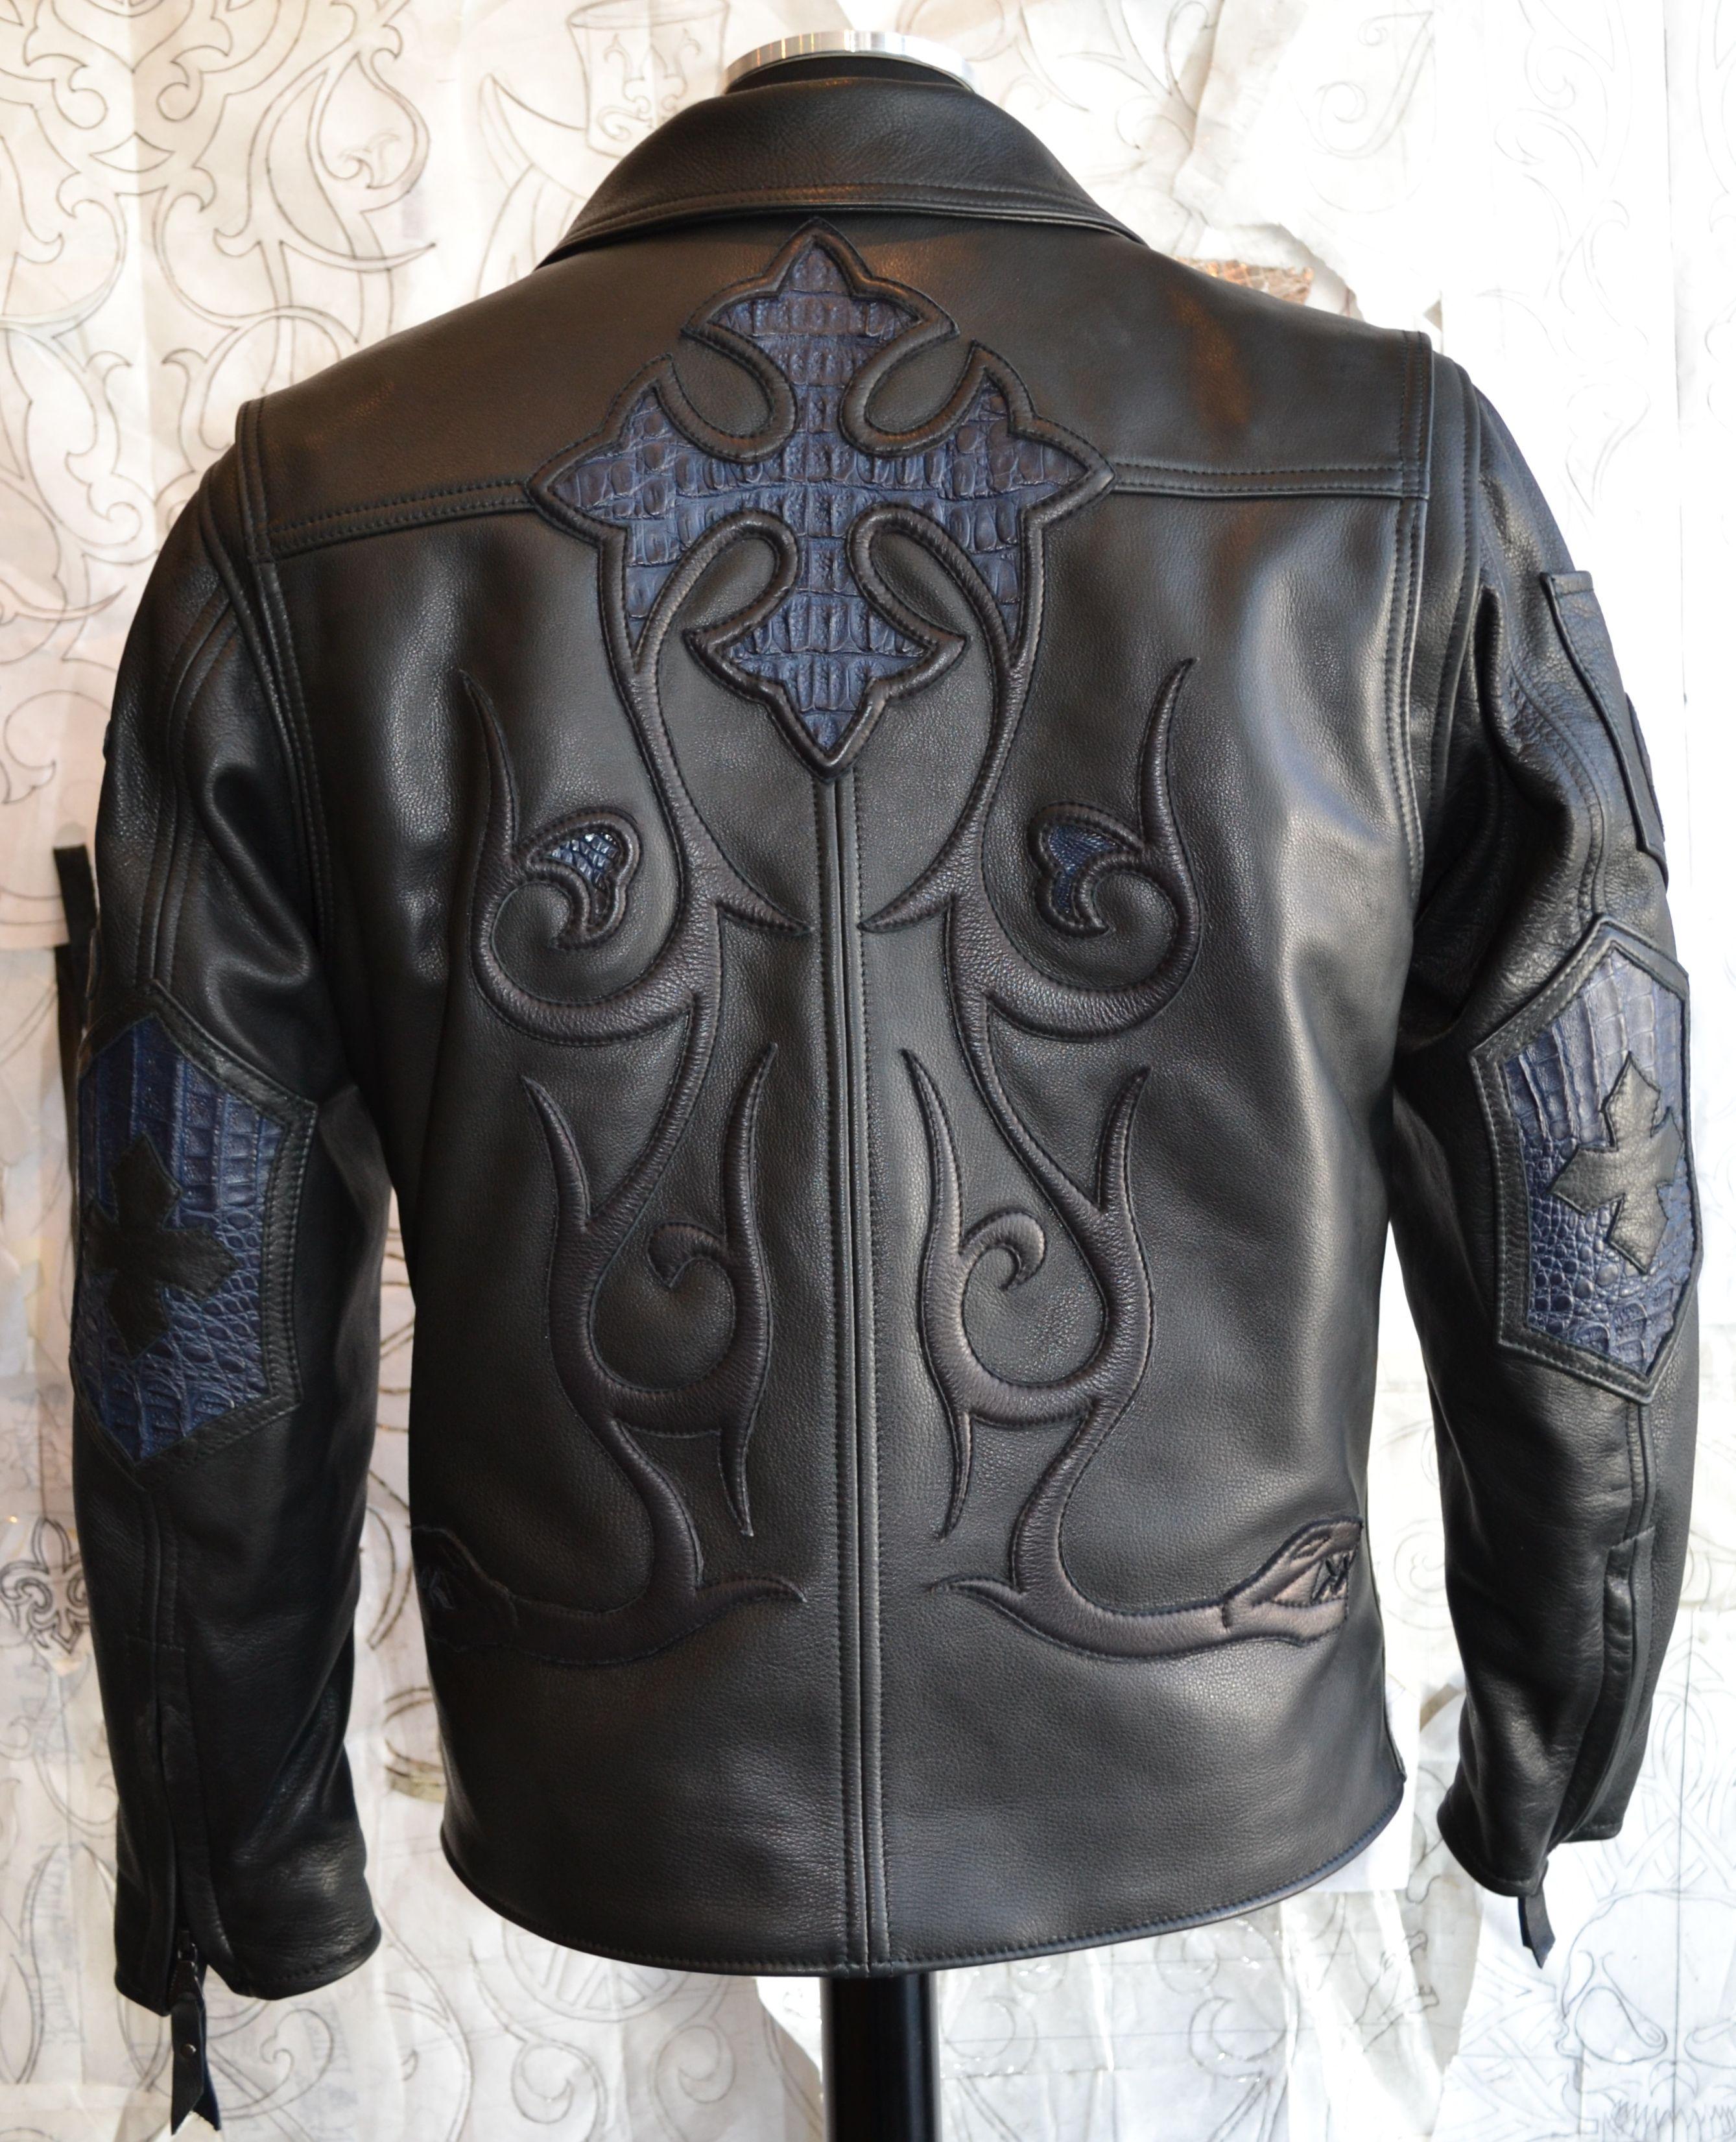 Logan Riese Rider jacket Leather with Dark blue Crocodile.